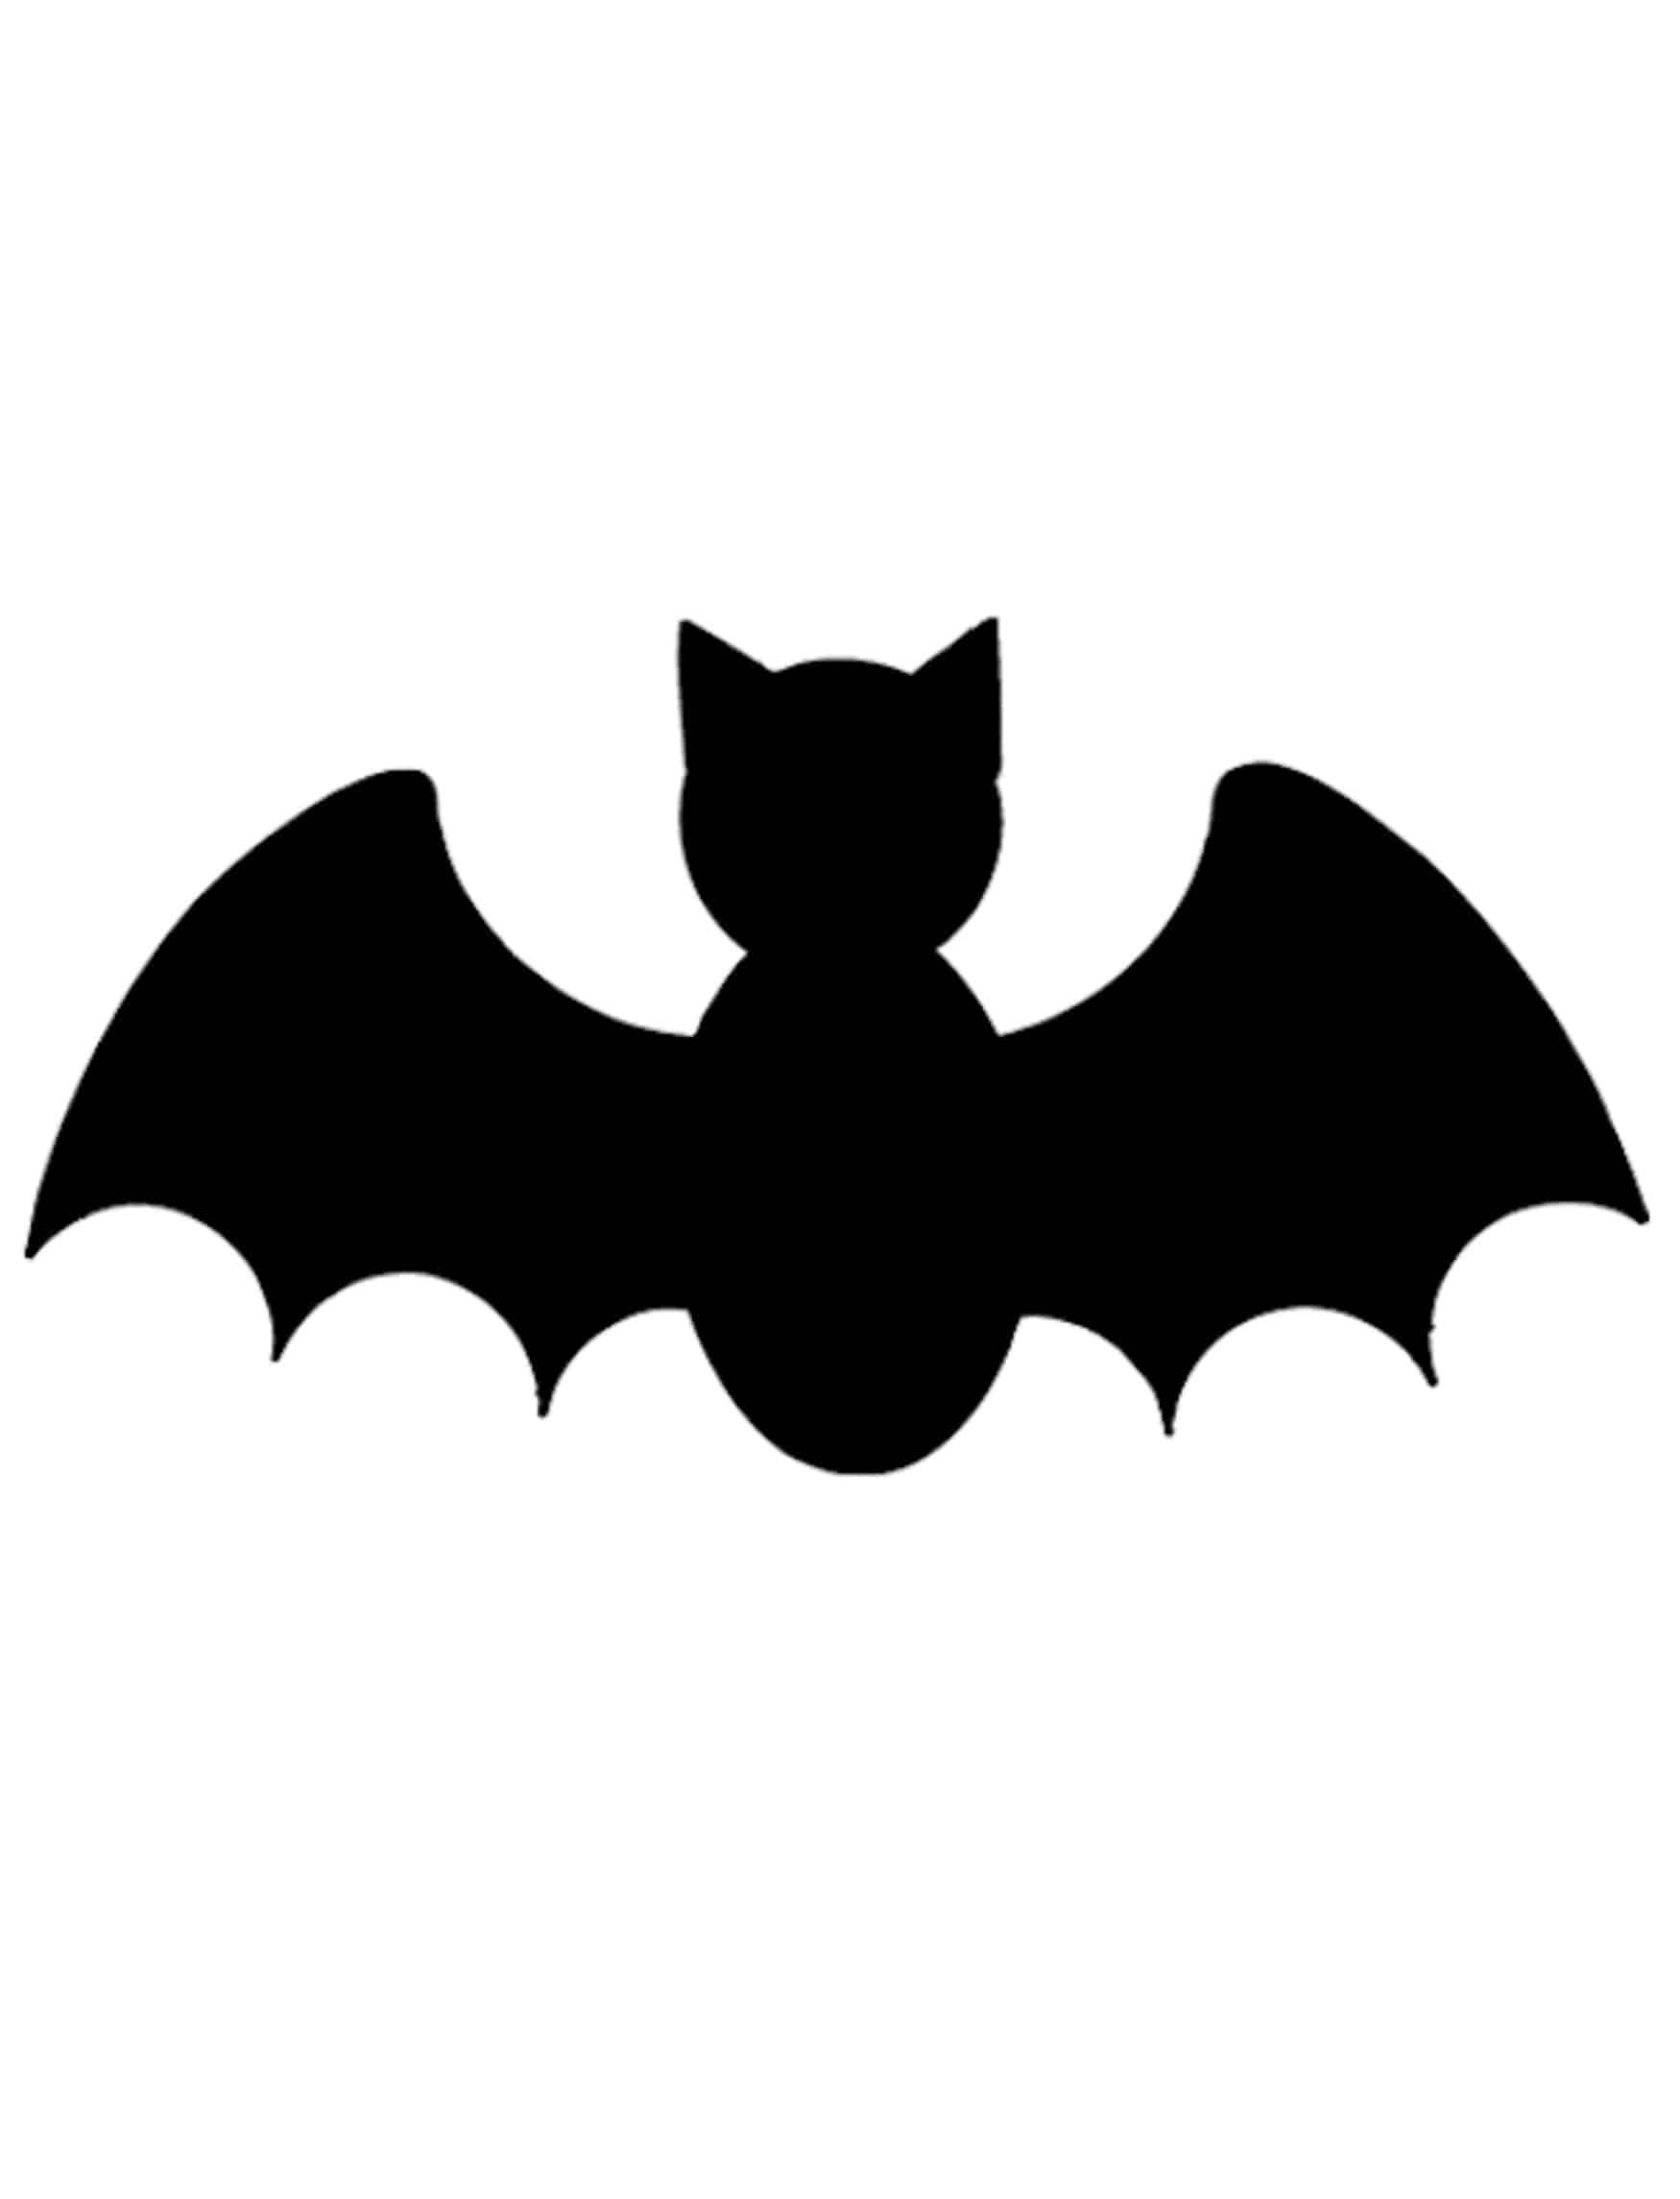 Simple Bat Pumpkin Carving Pattern